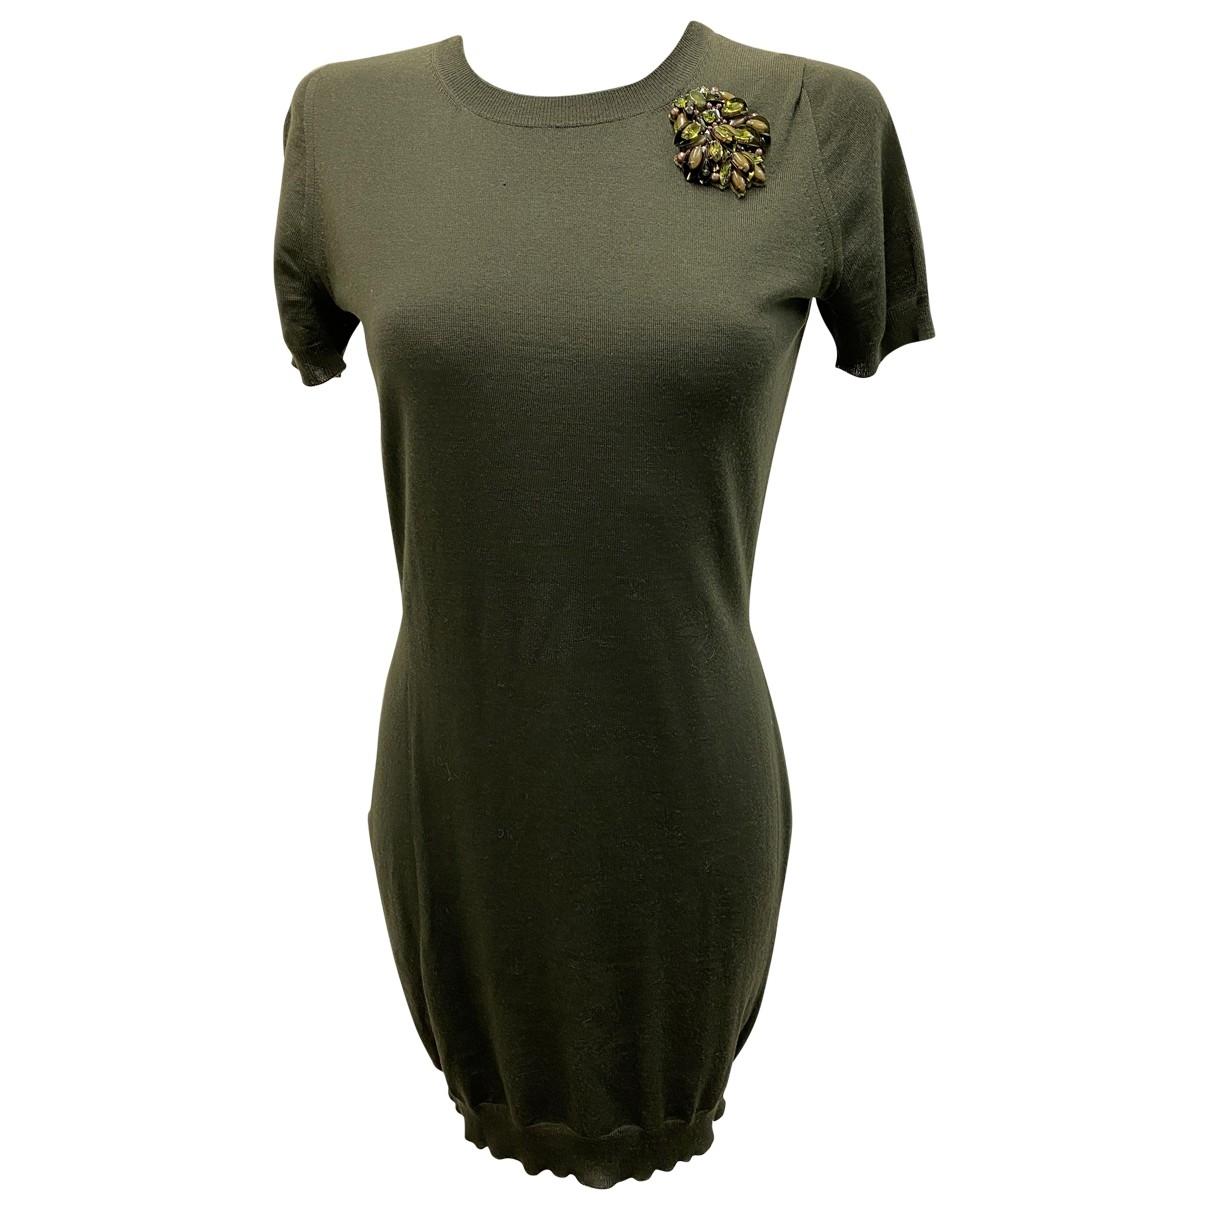 Gucci \N Khaki Wool dress for Women S International